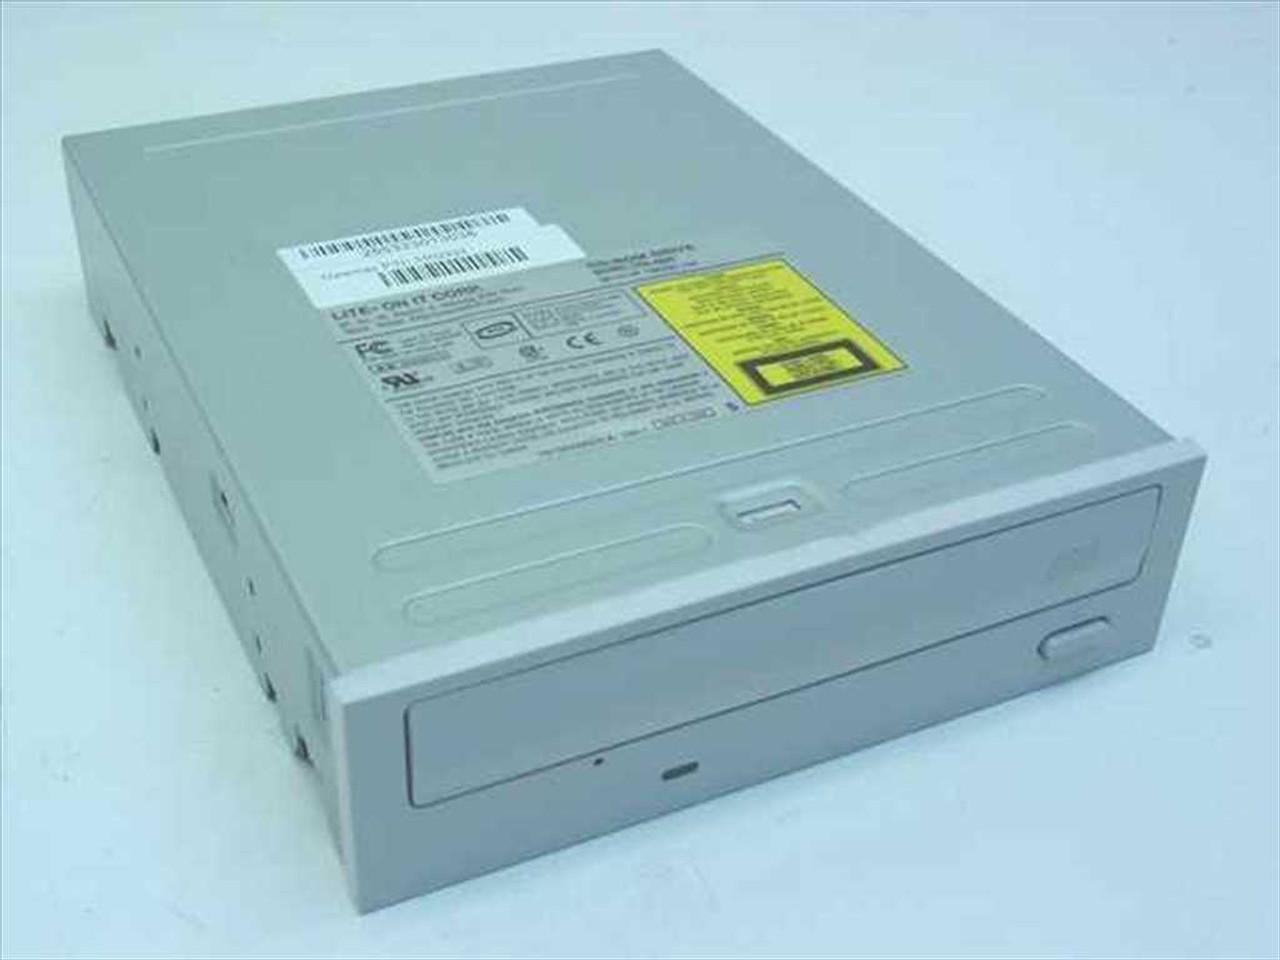 COMPAQ DVD-ROM GDR8160B DRIVERS FOR WINDOWS 7